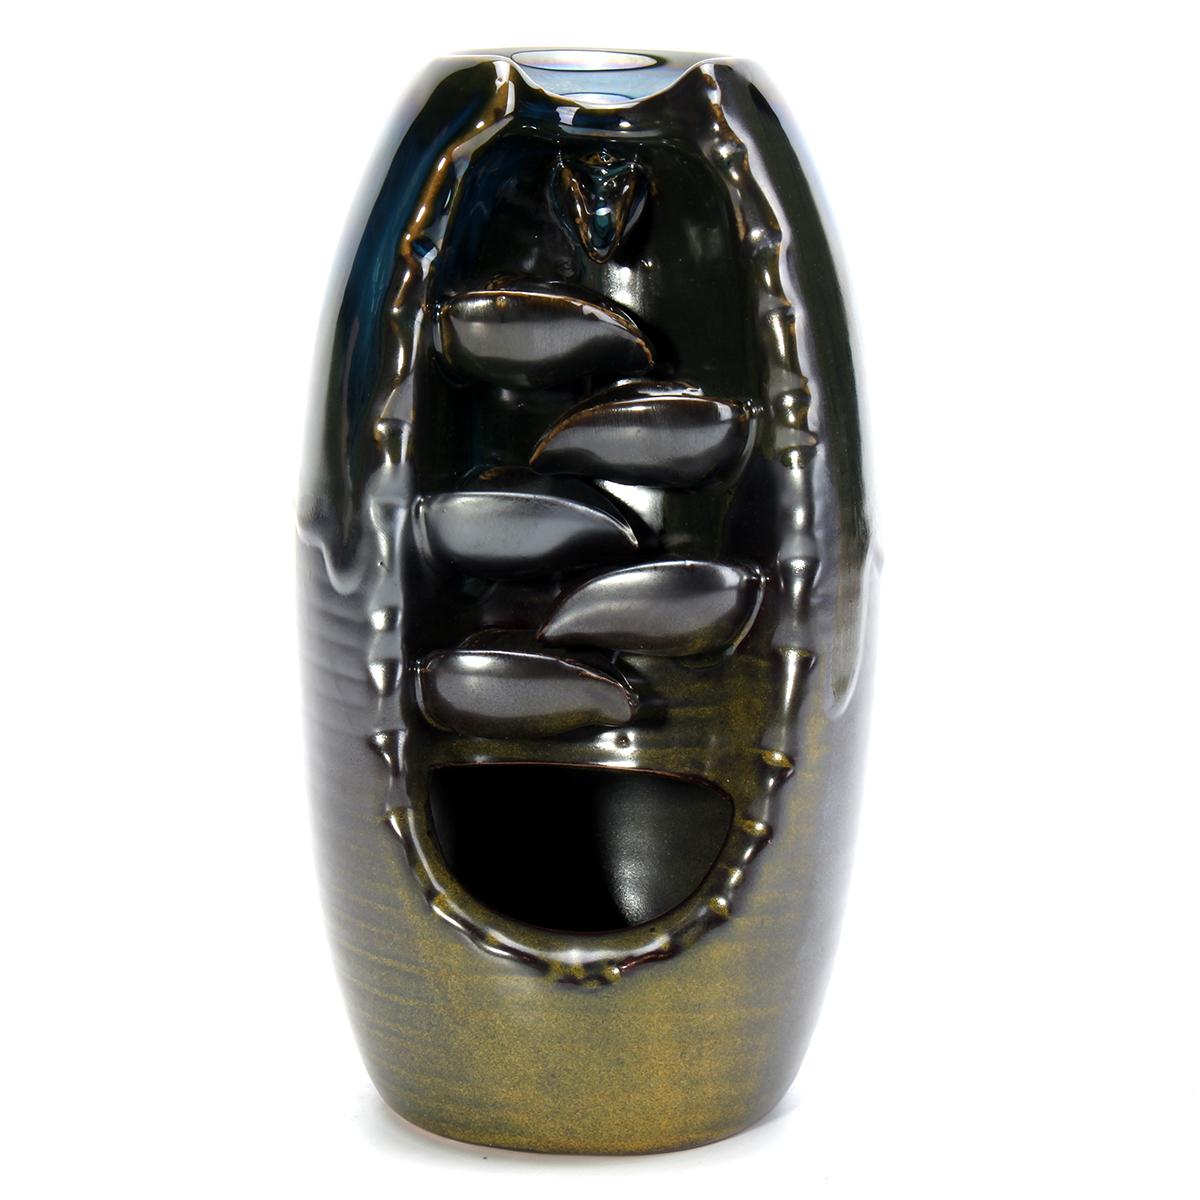 Porcelain Waterfall Backflow Ceramic Incense Burner Censer Holder Decor 10 Cones Office Home Decor